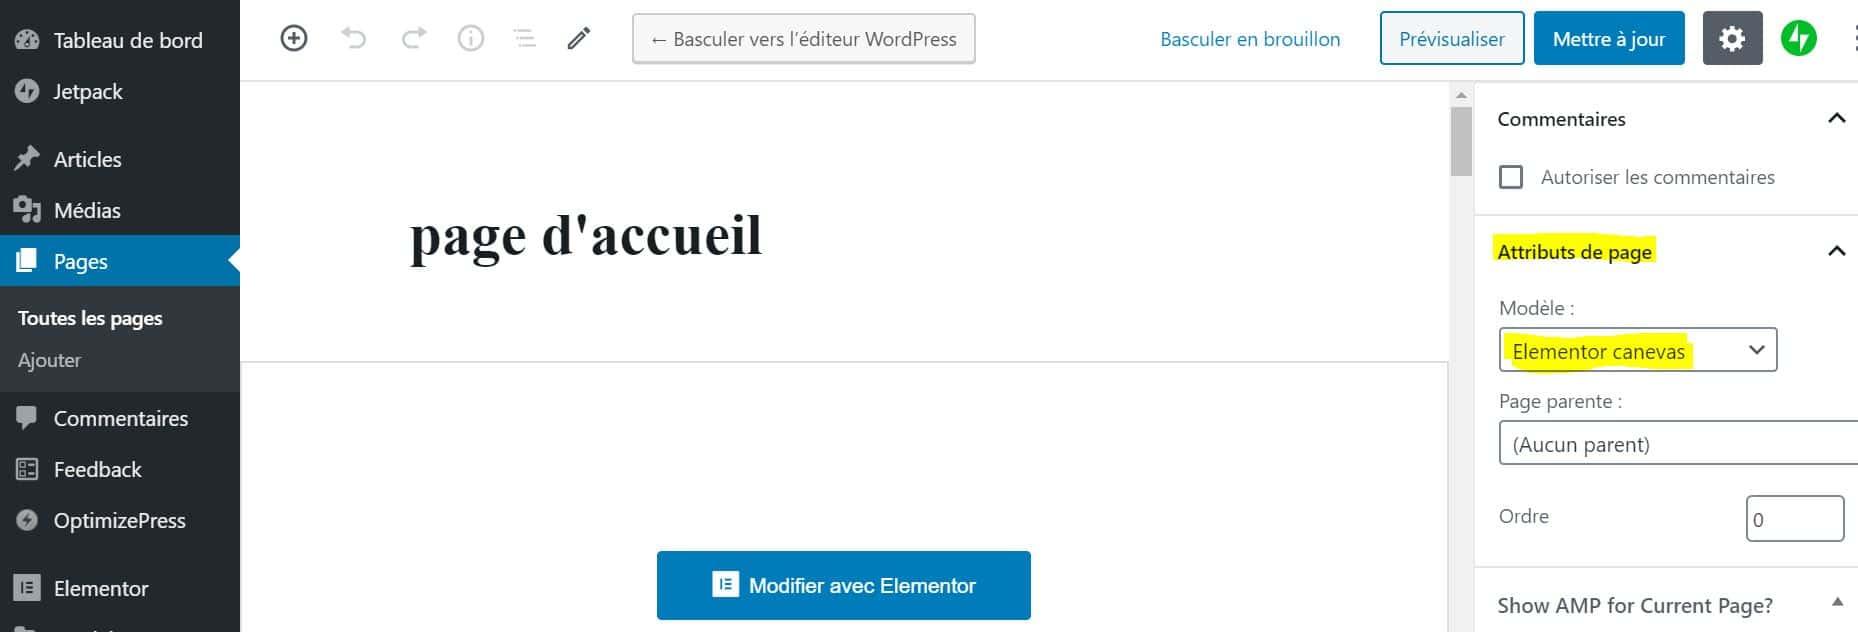 Créer Une Page Accueil WordPress Elementor Canvas